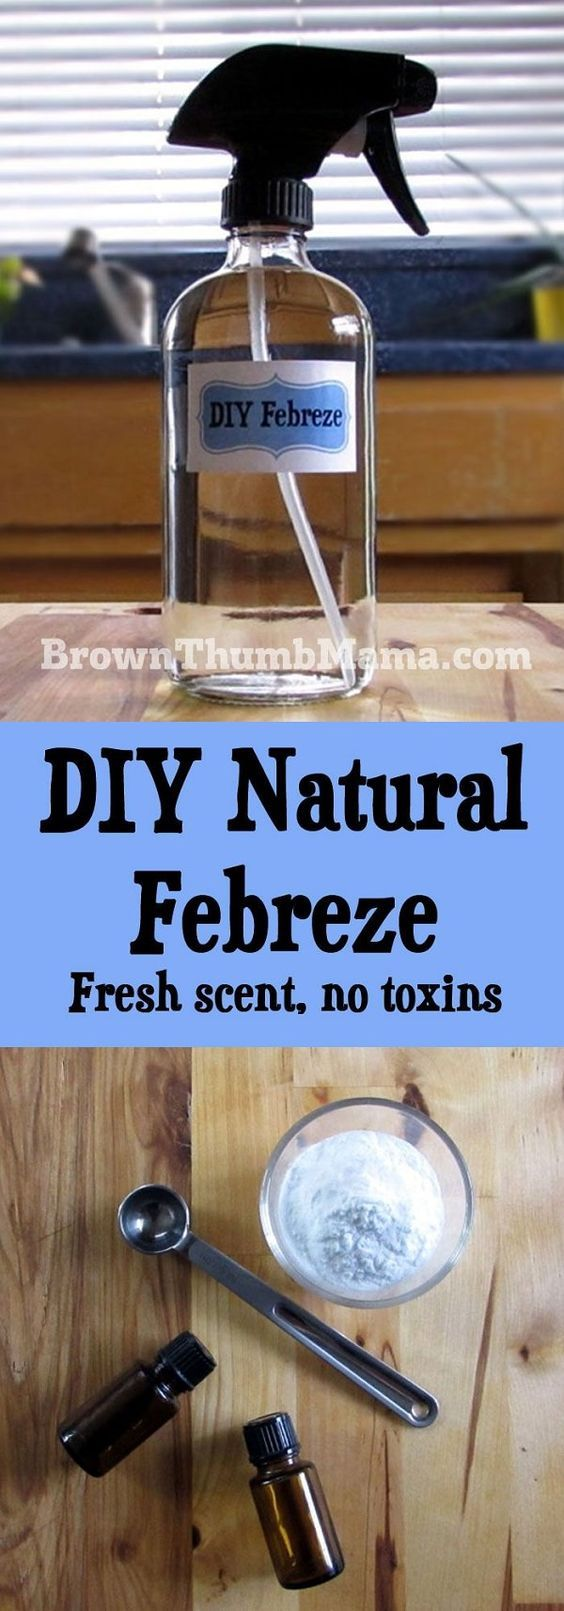 DIY Natural Febreze With Just 3 Ingredients